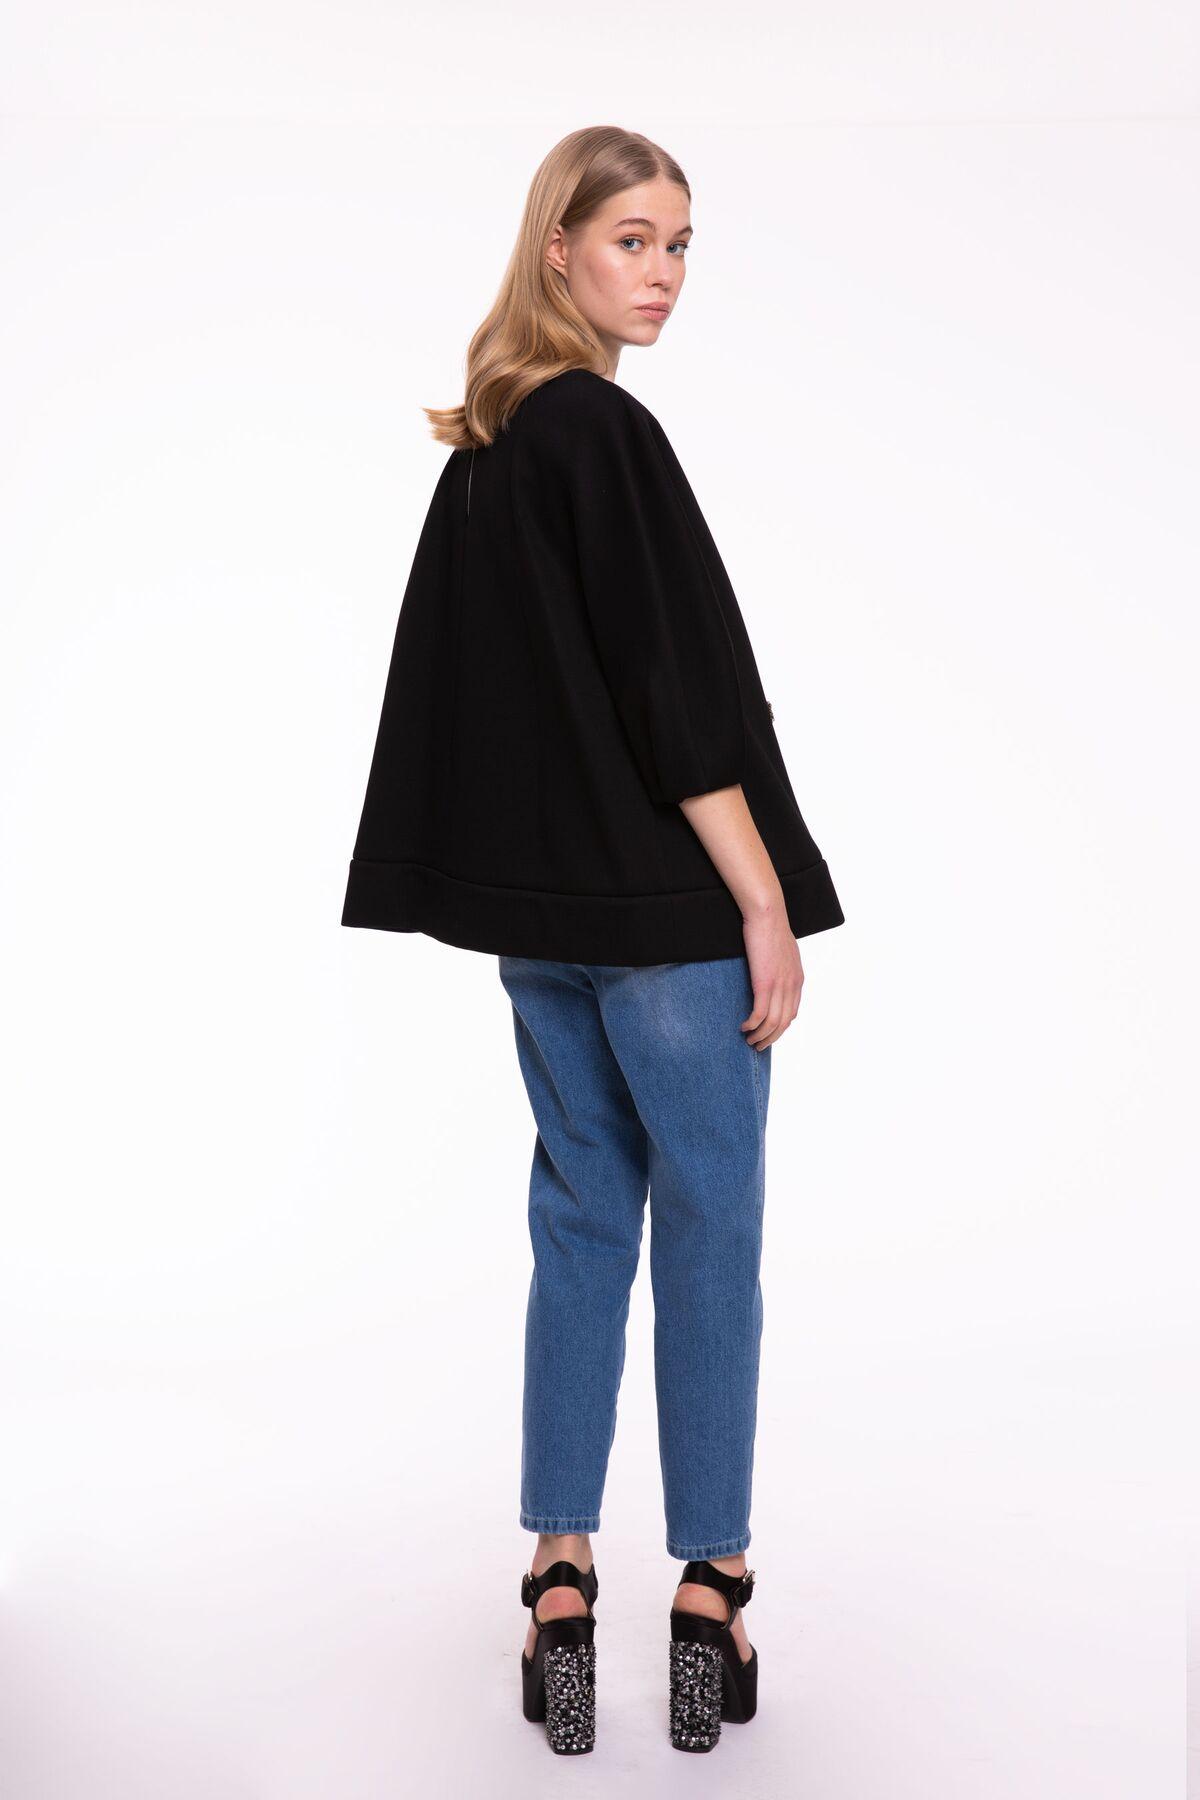 Taş İşlemeli Yarım Kol Siyah Sweatshirt